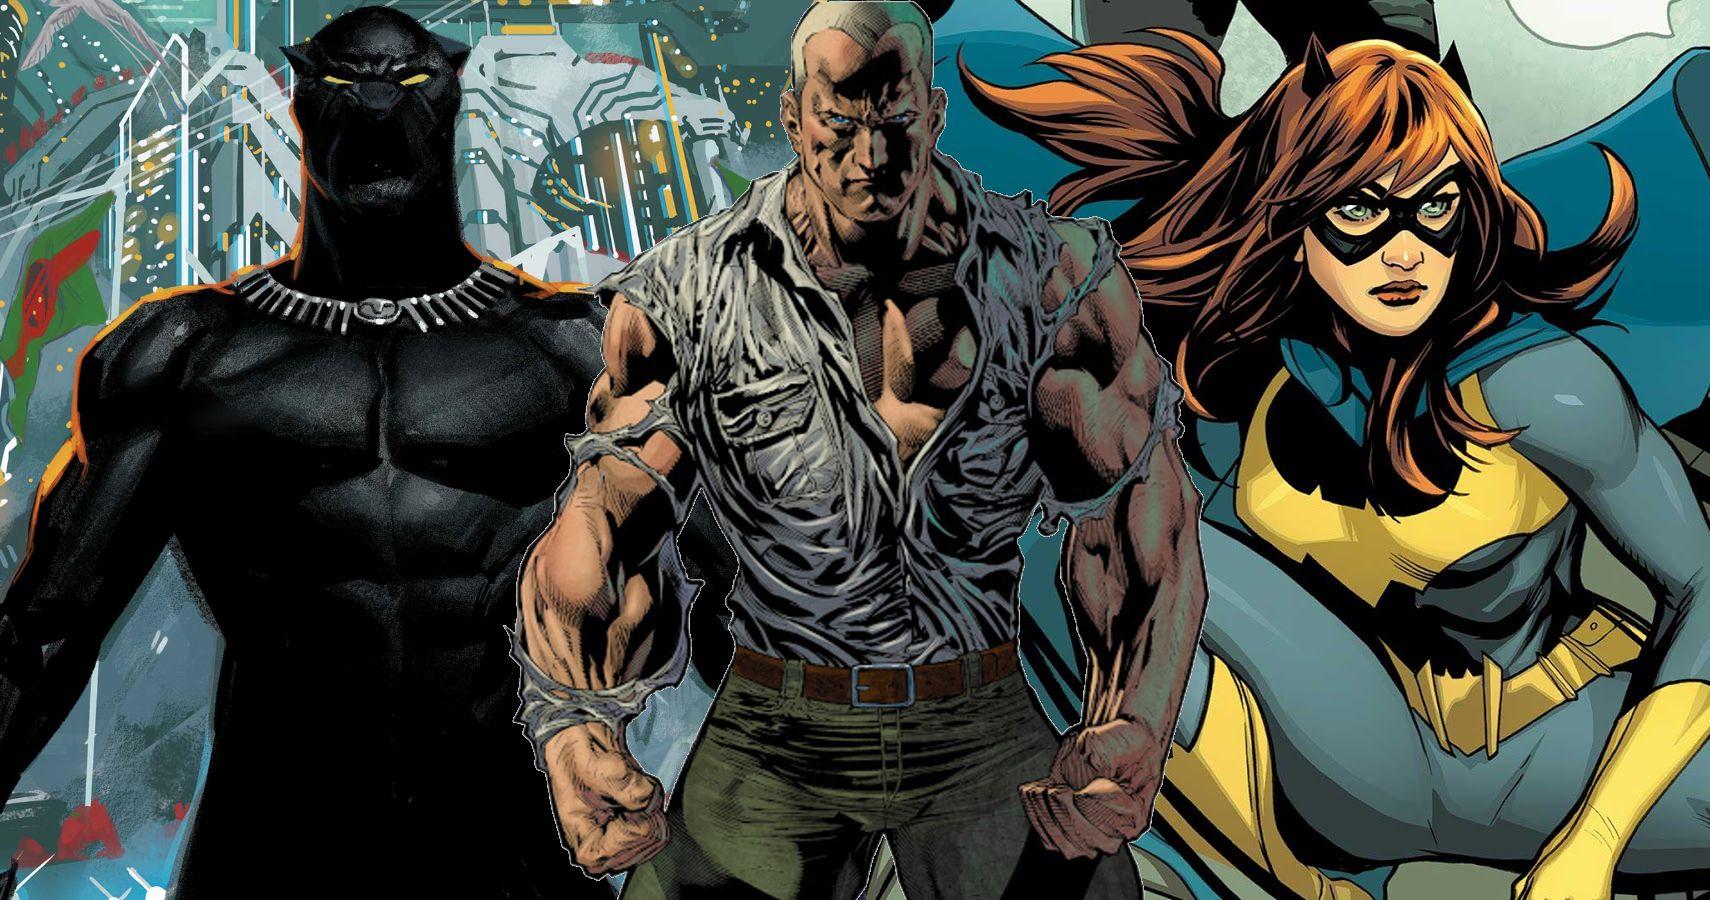 Super Smarts: 10 Superheroes Who Have Doctorates